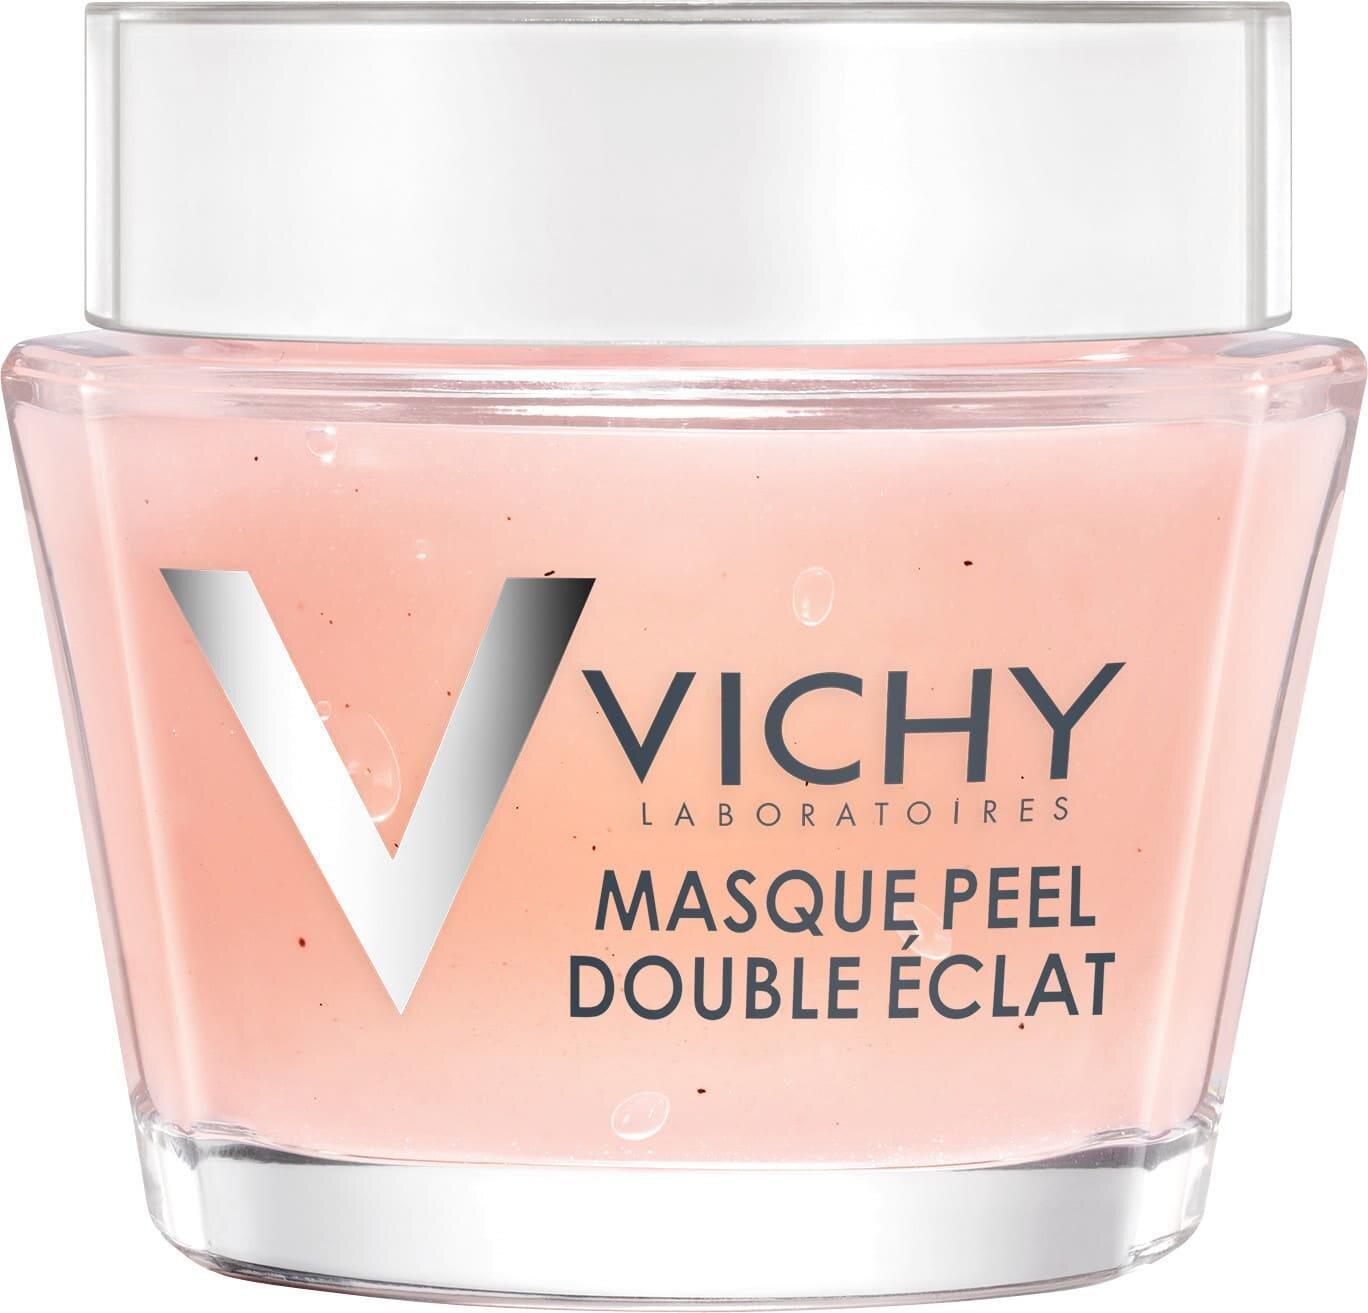 Mặt nạ khoáng chất Vichy Double Glow Peel Mask 75ml